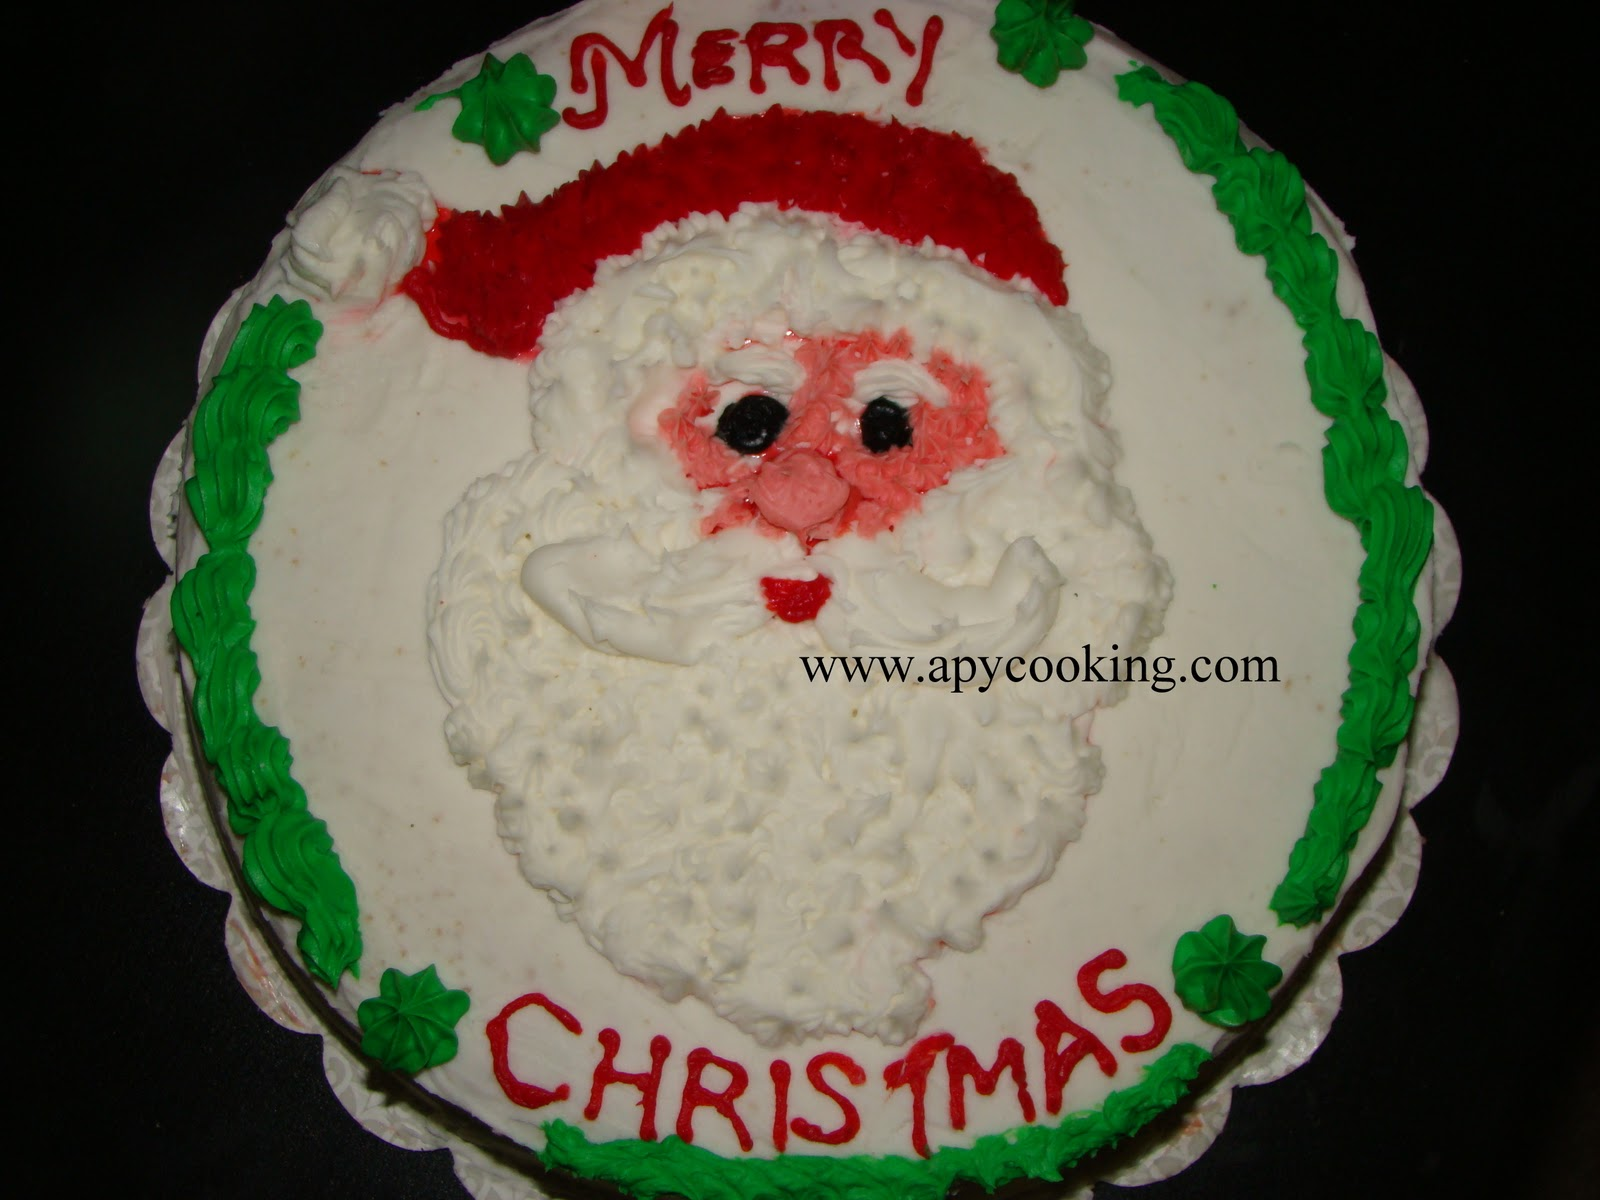 Apy Cooking Merry Christmas Reposting Santa Claus Cake